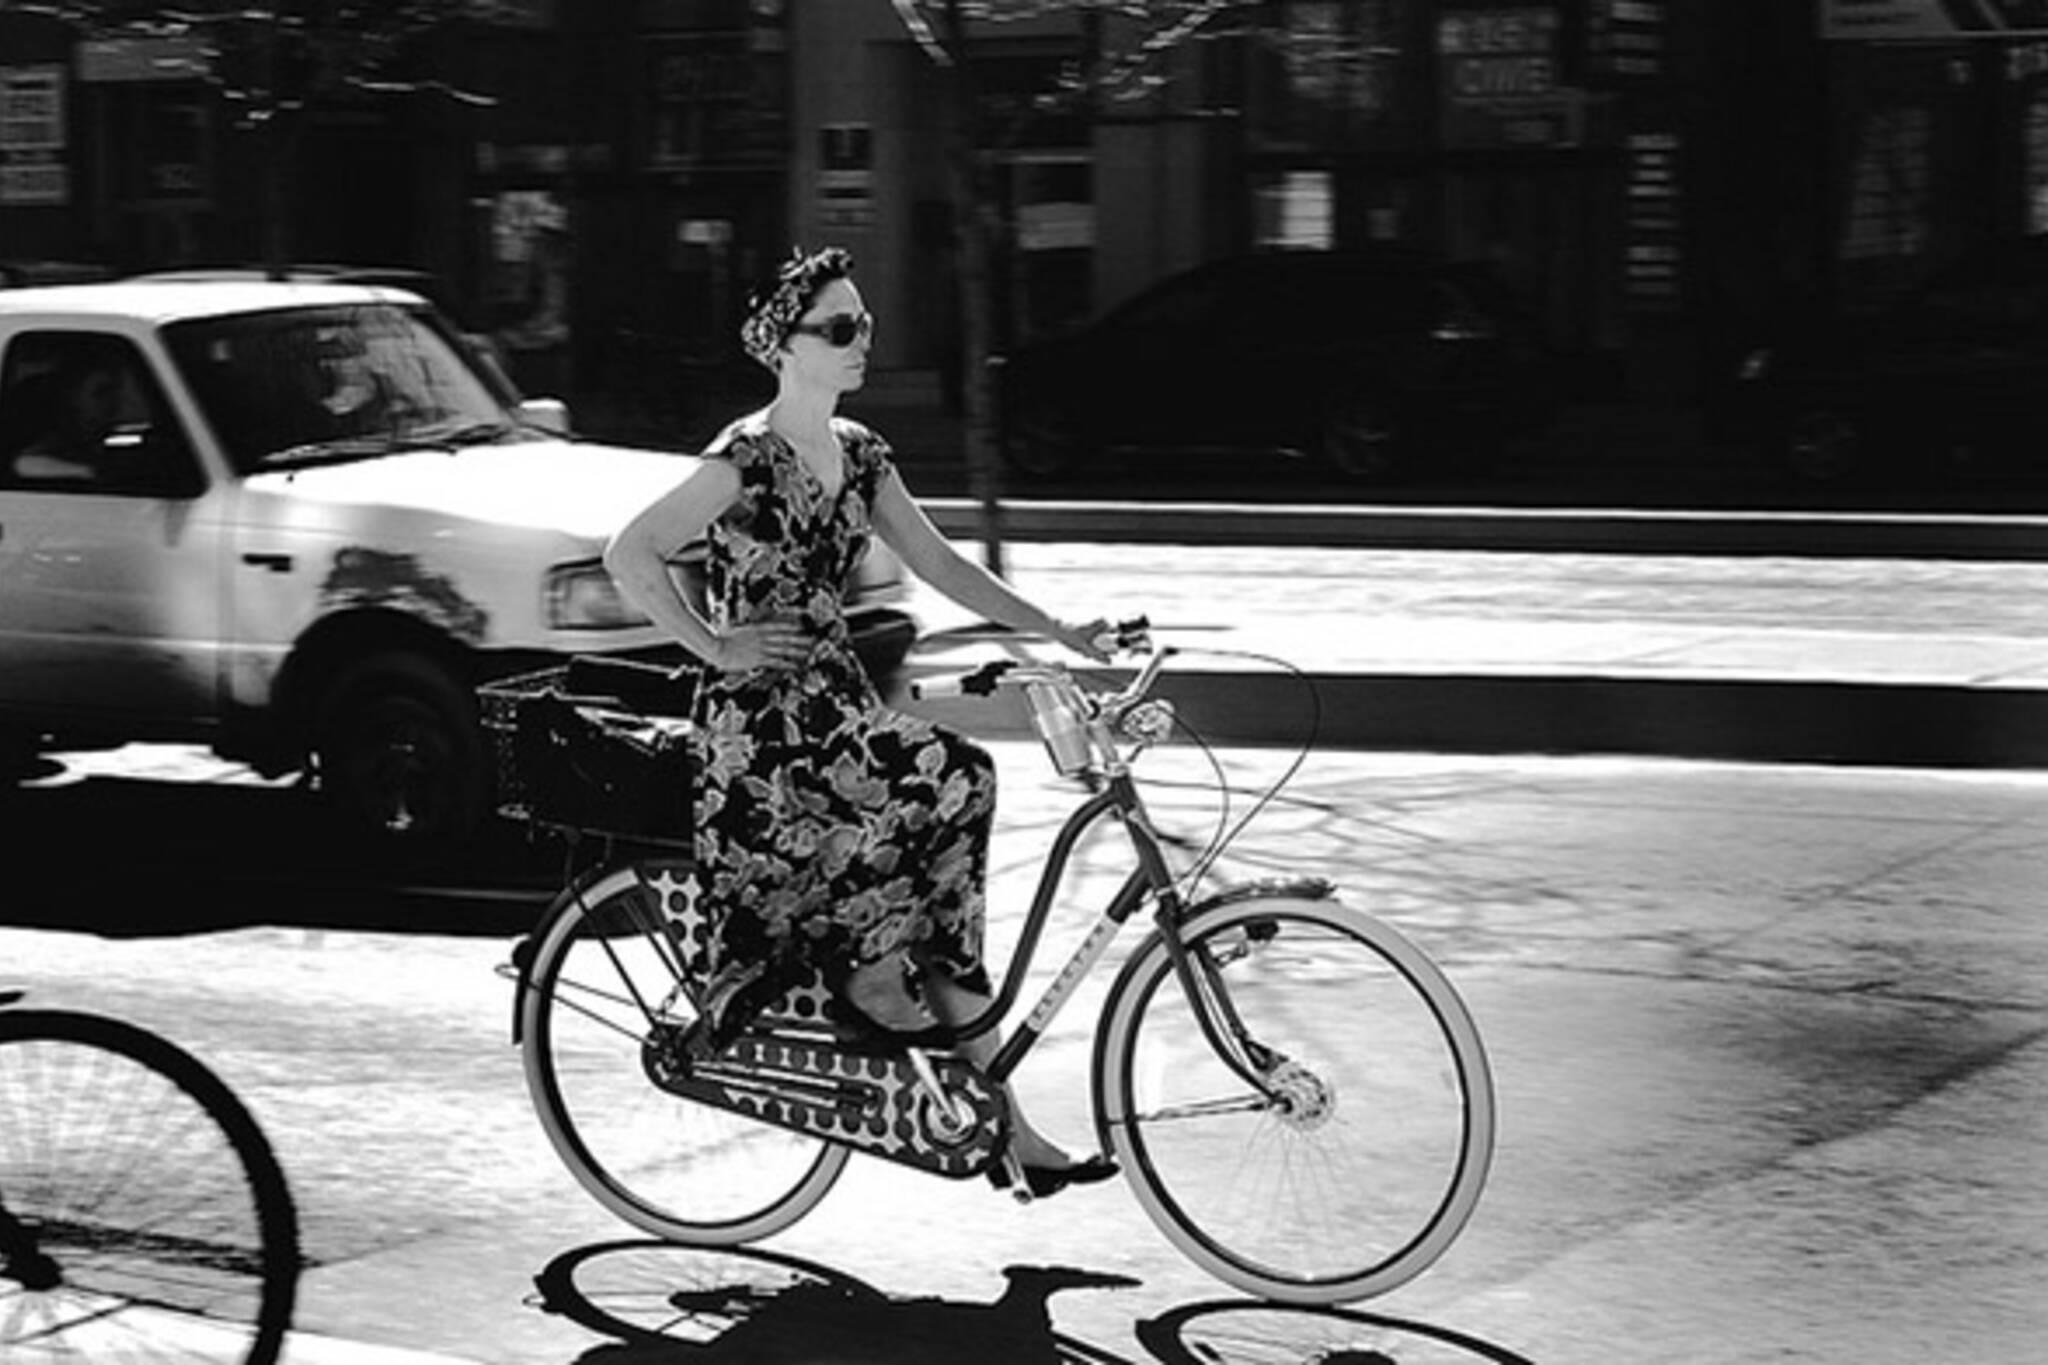 Bike Ride Style